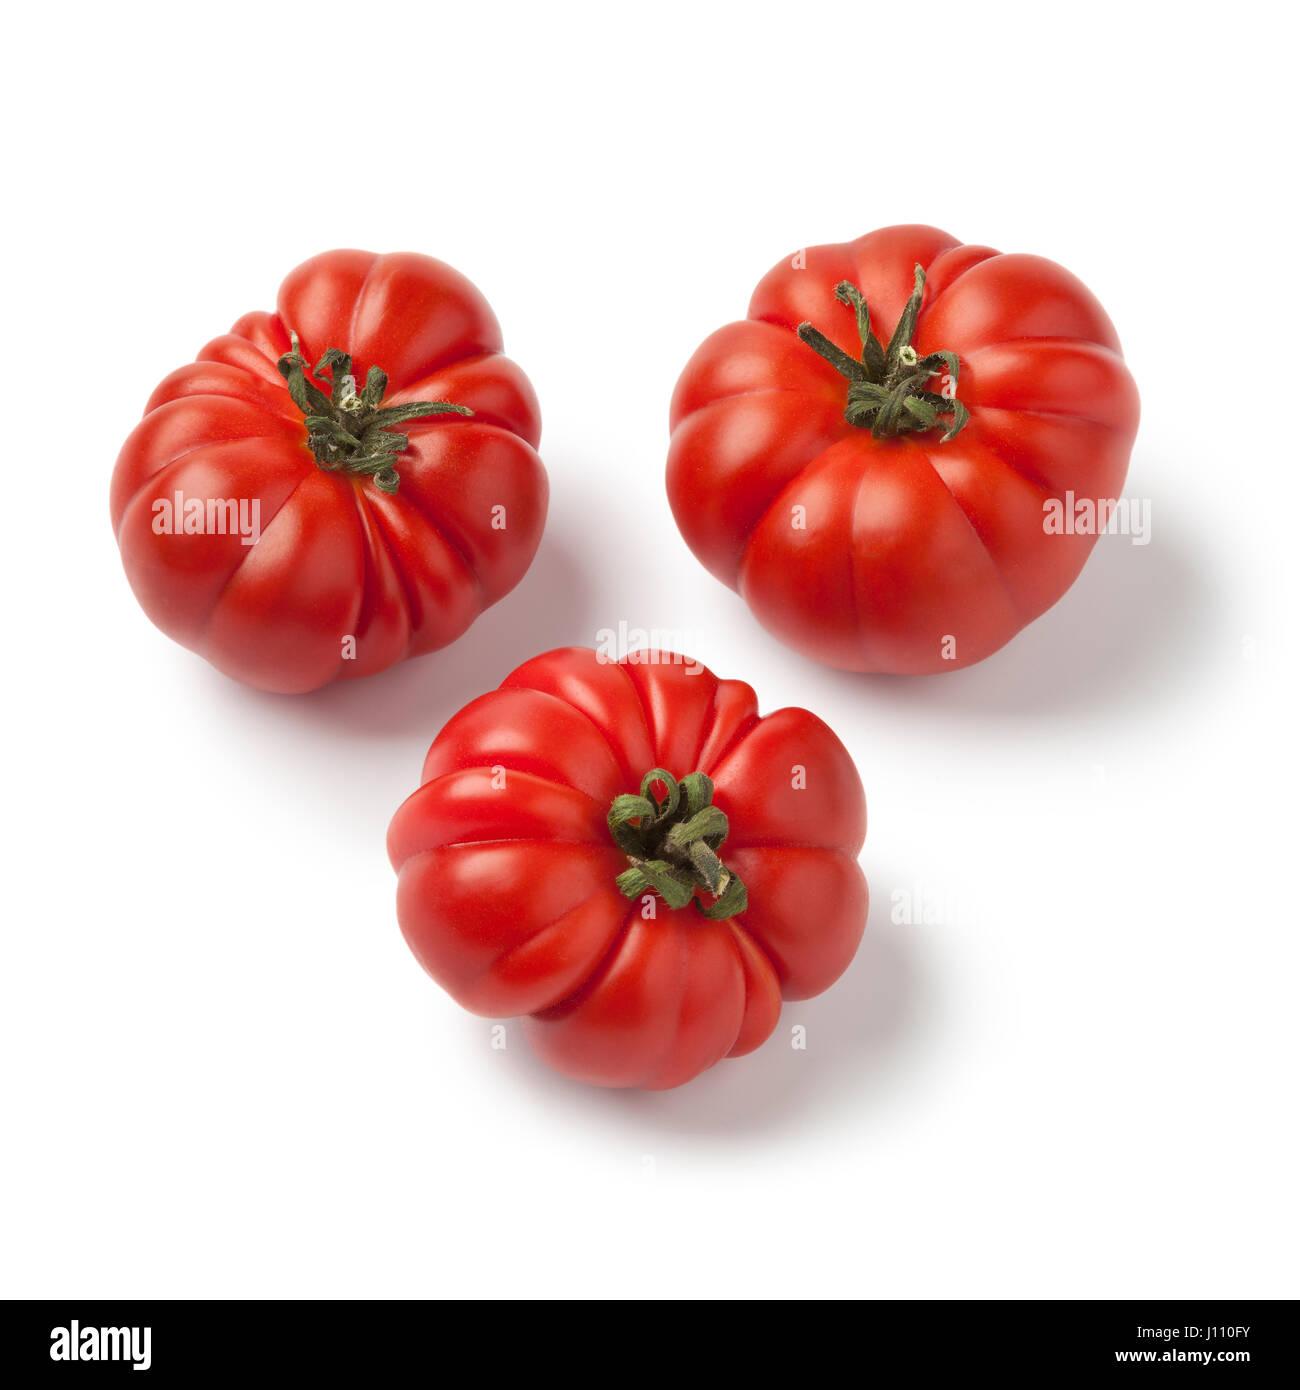 Fresh red ripe merinda tomatoes on white background - Stock Image